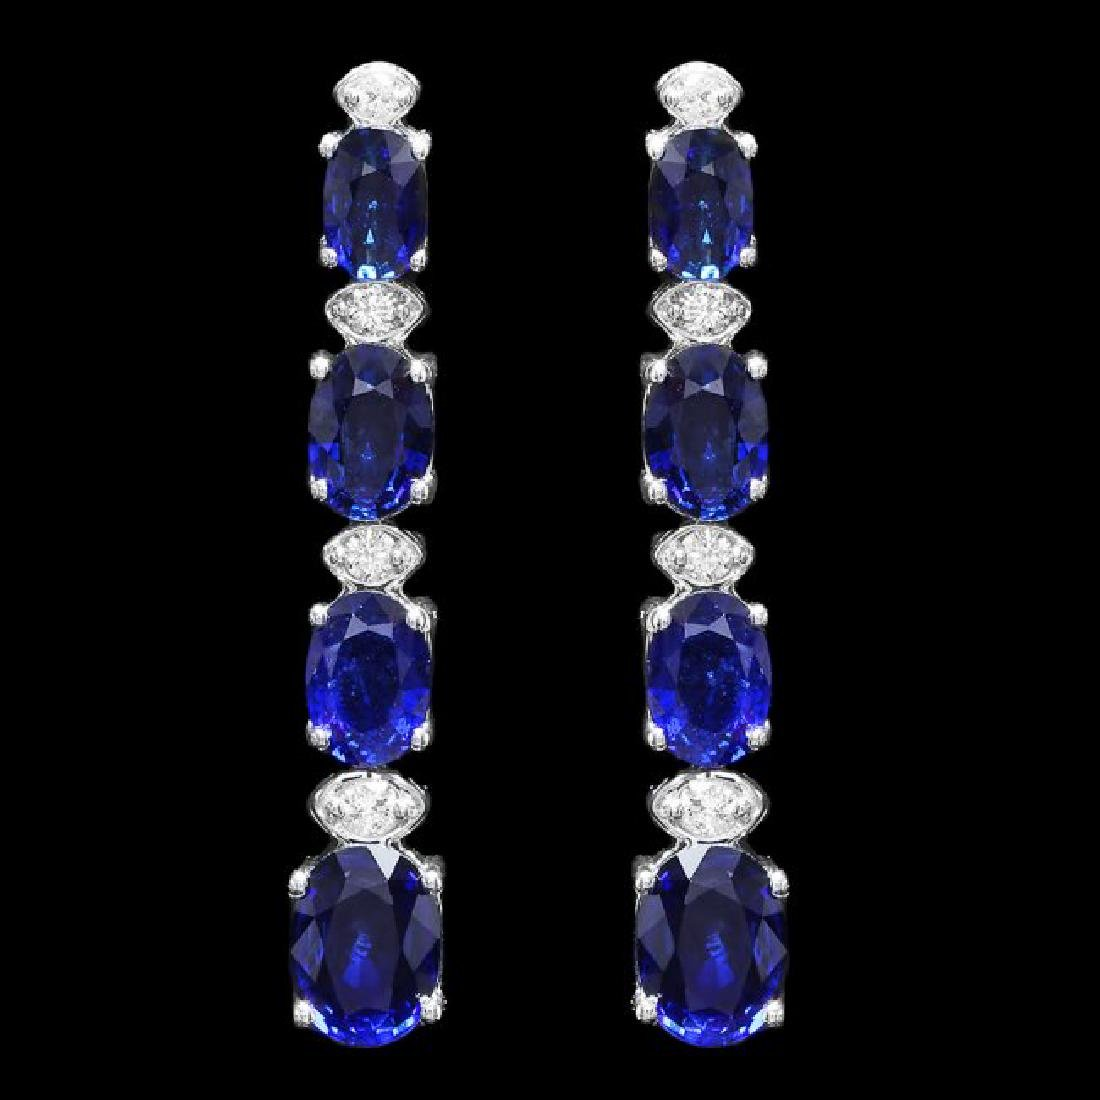 14k Gold 6.50ct Sapphire 0.30ct Diamond Earrings